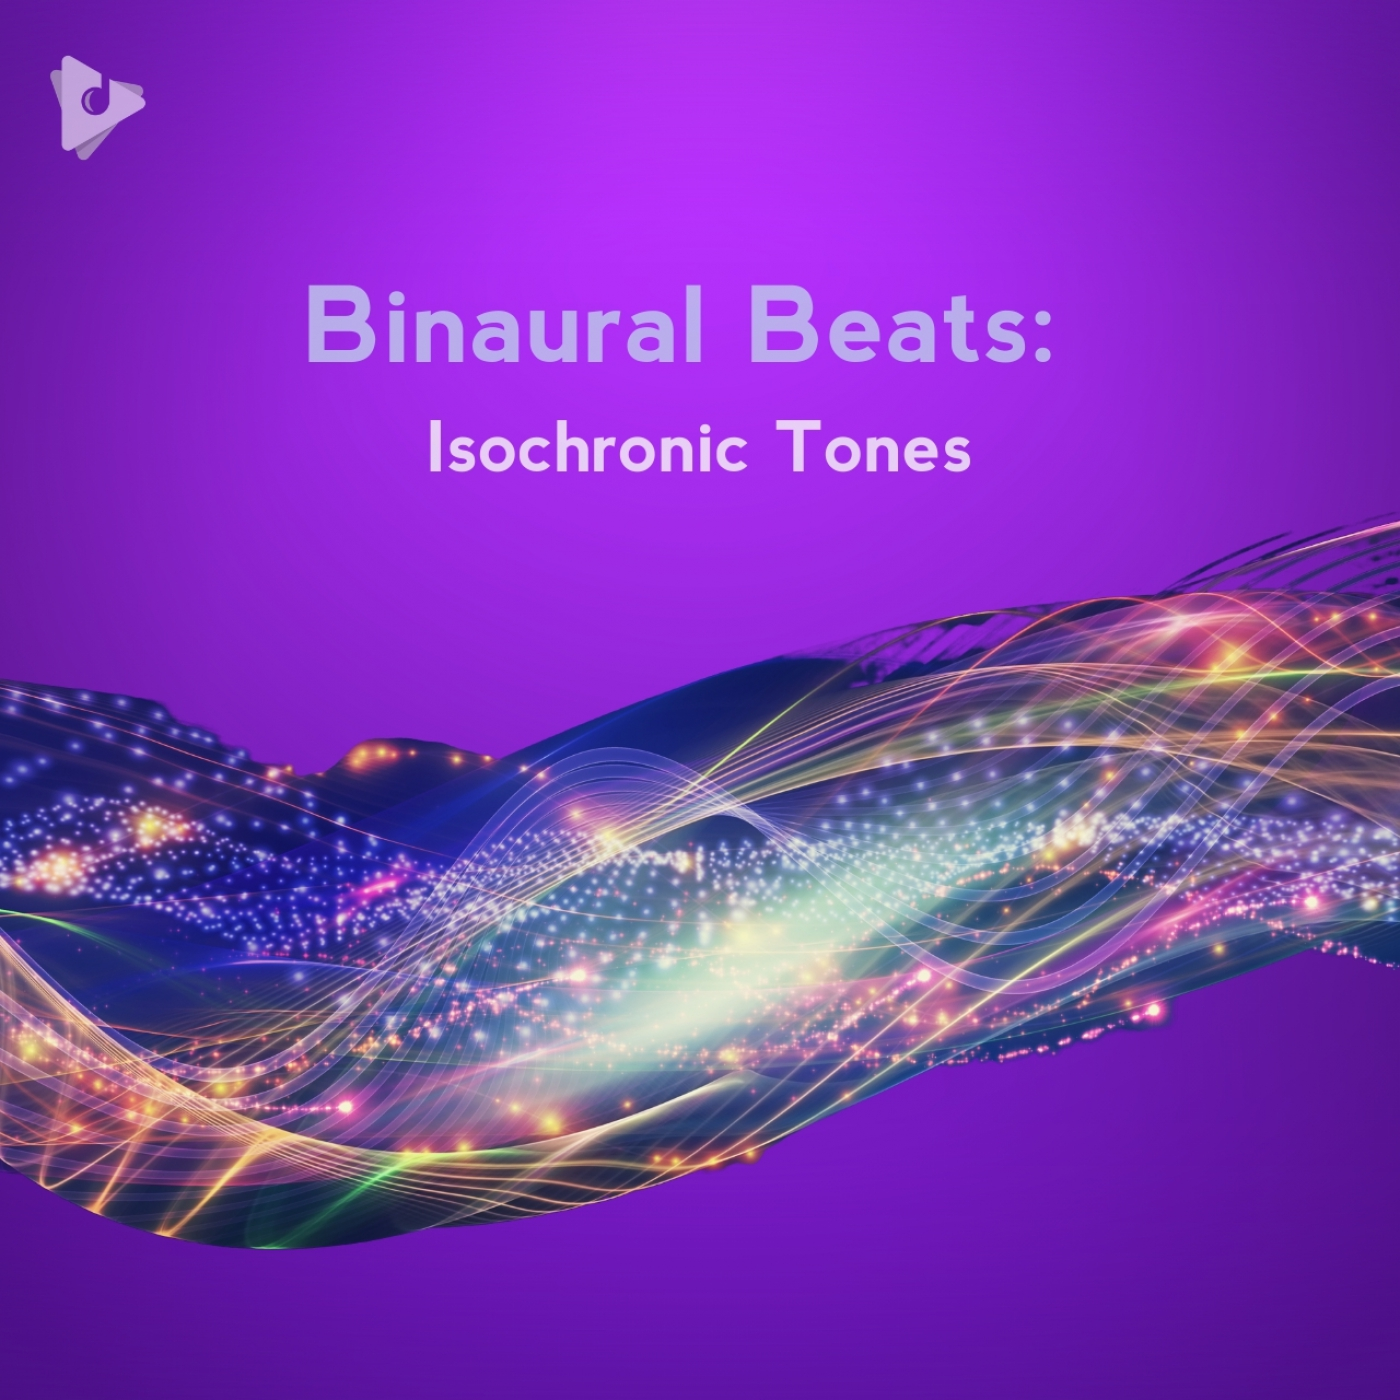 Binaural Beats: Isochronic Tones